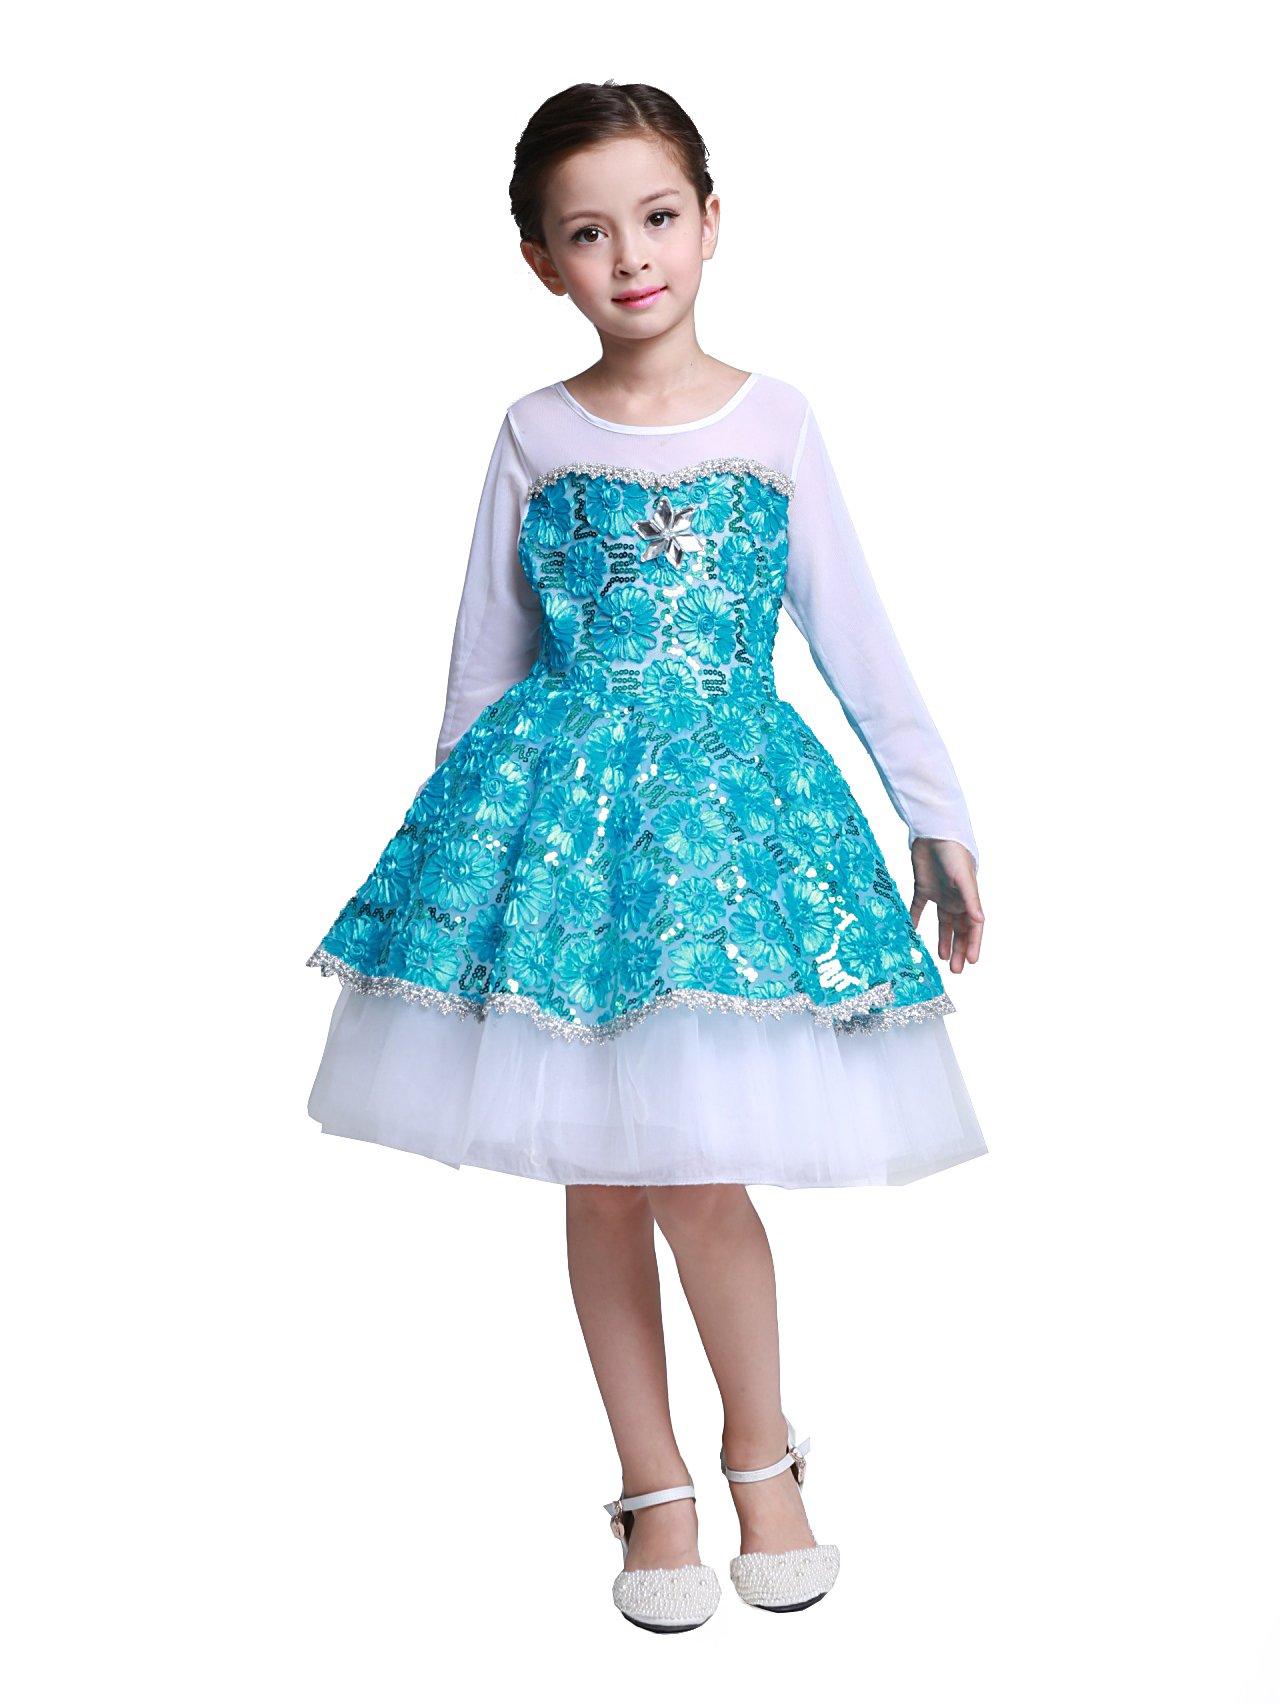 - 71Q0APPeJpL - Dressy Daisy Girls' Princess Elsa Costume Halloween Fancy Dress Princess Dresses